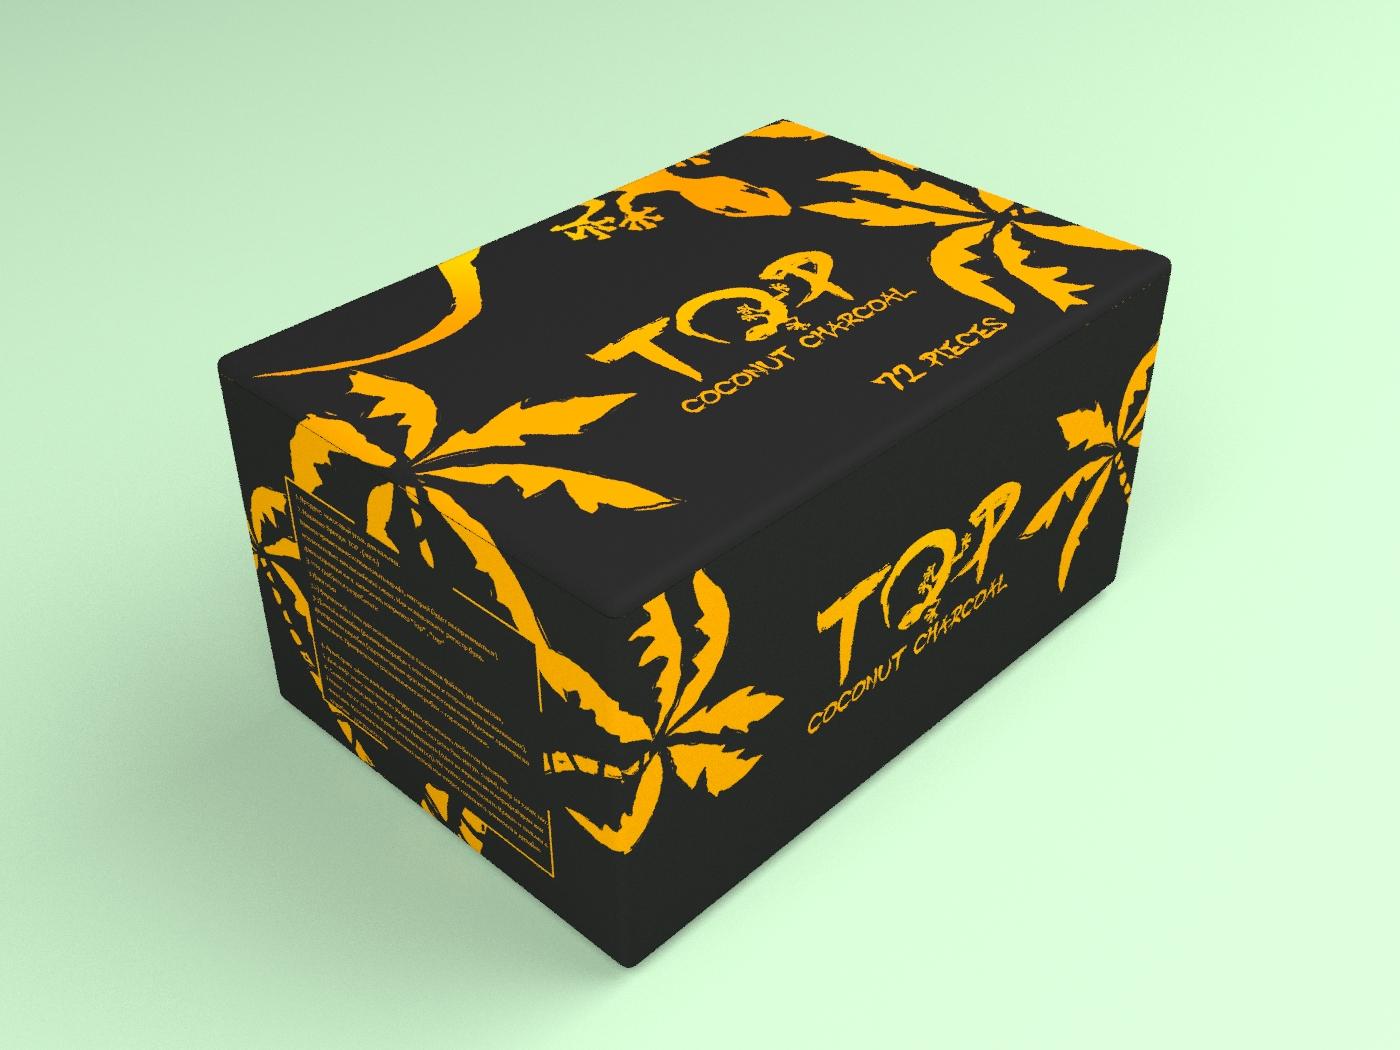 Разработка дизайна коробки, фирменного стиля, логотипа. фото f_7935c5fcd9fdf6ad.jpg